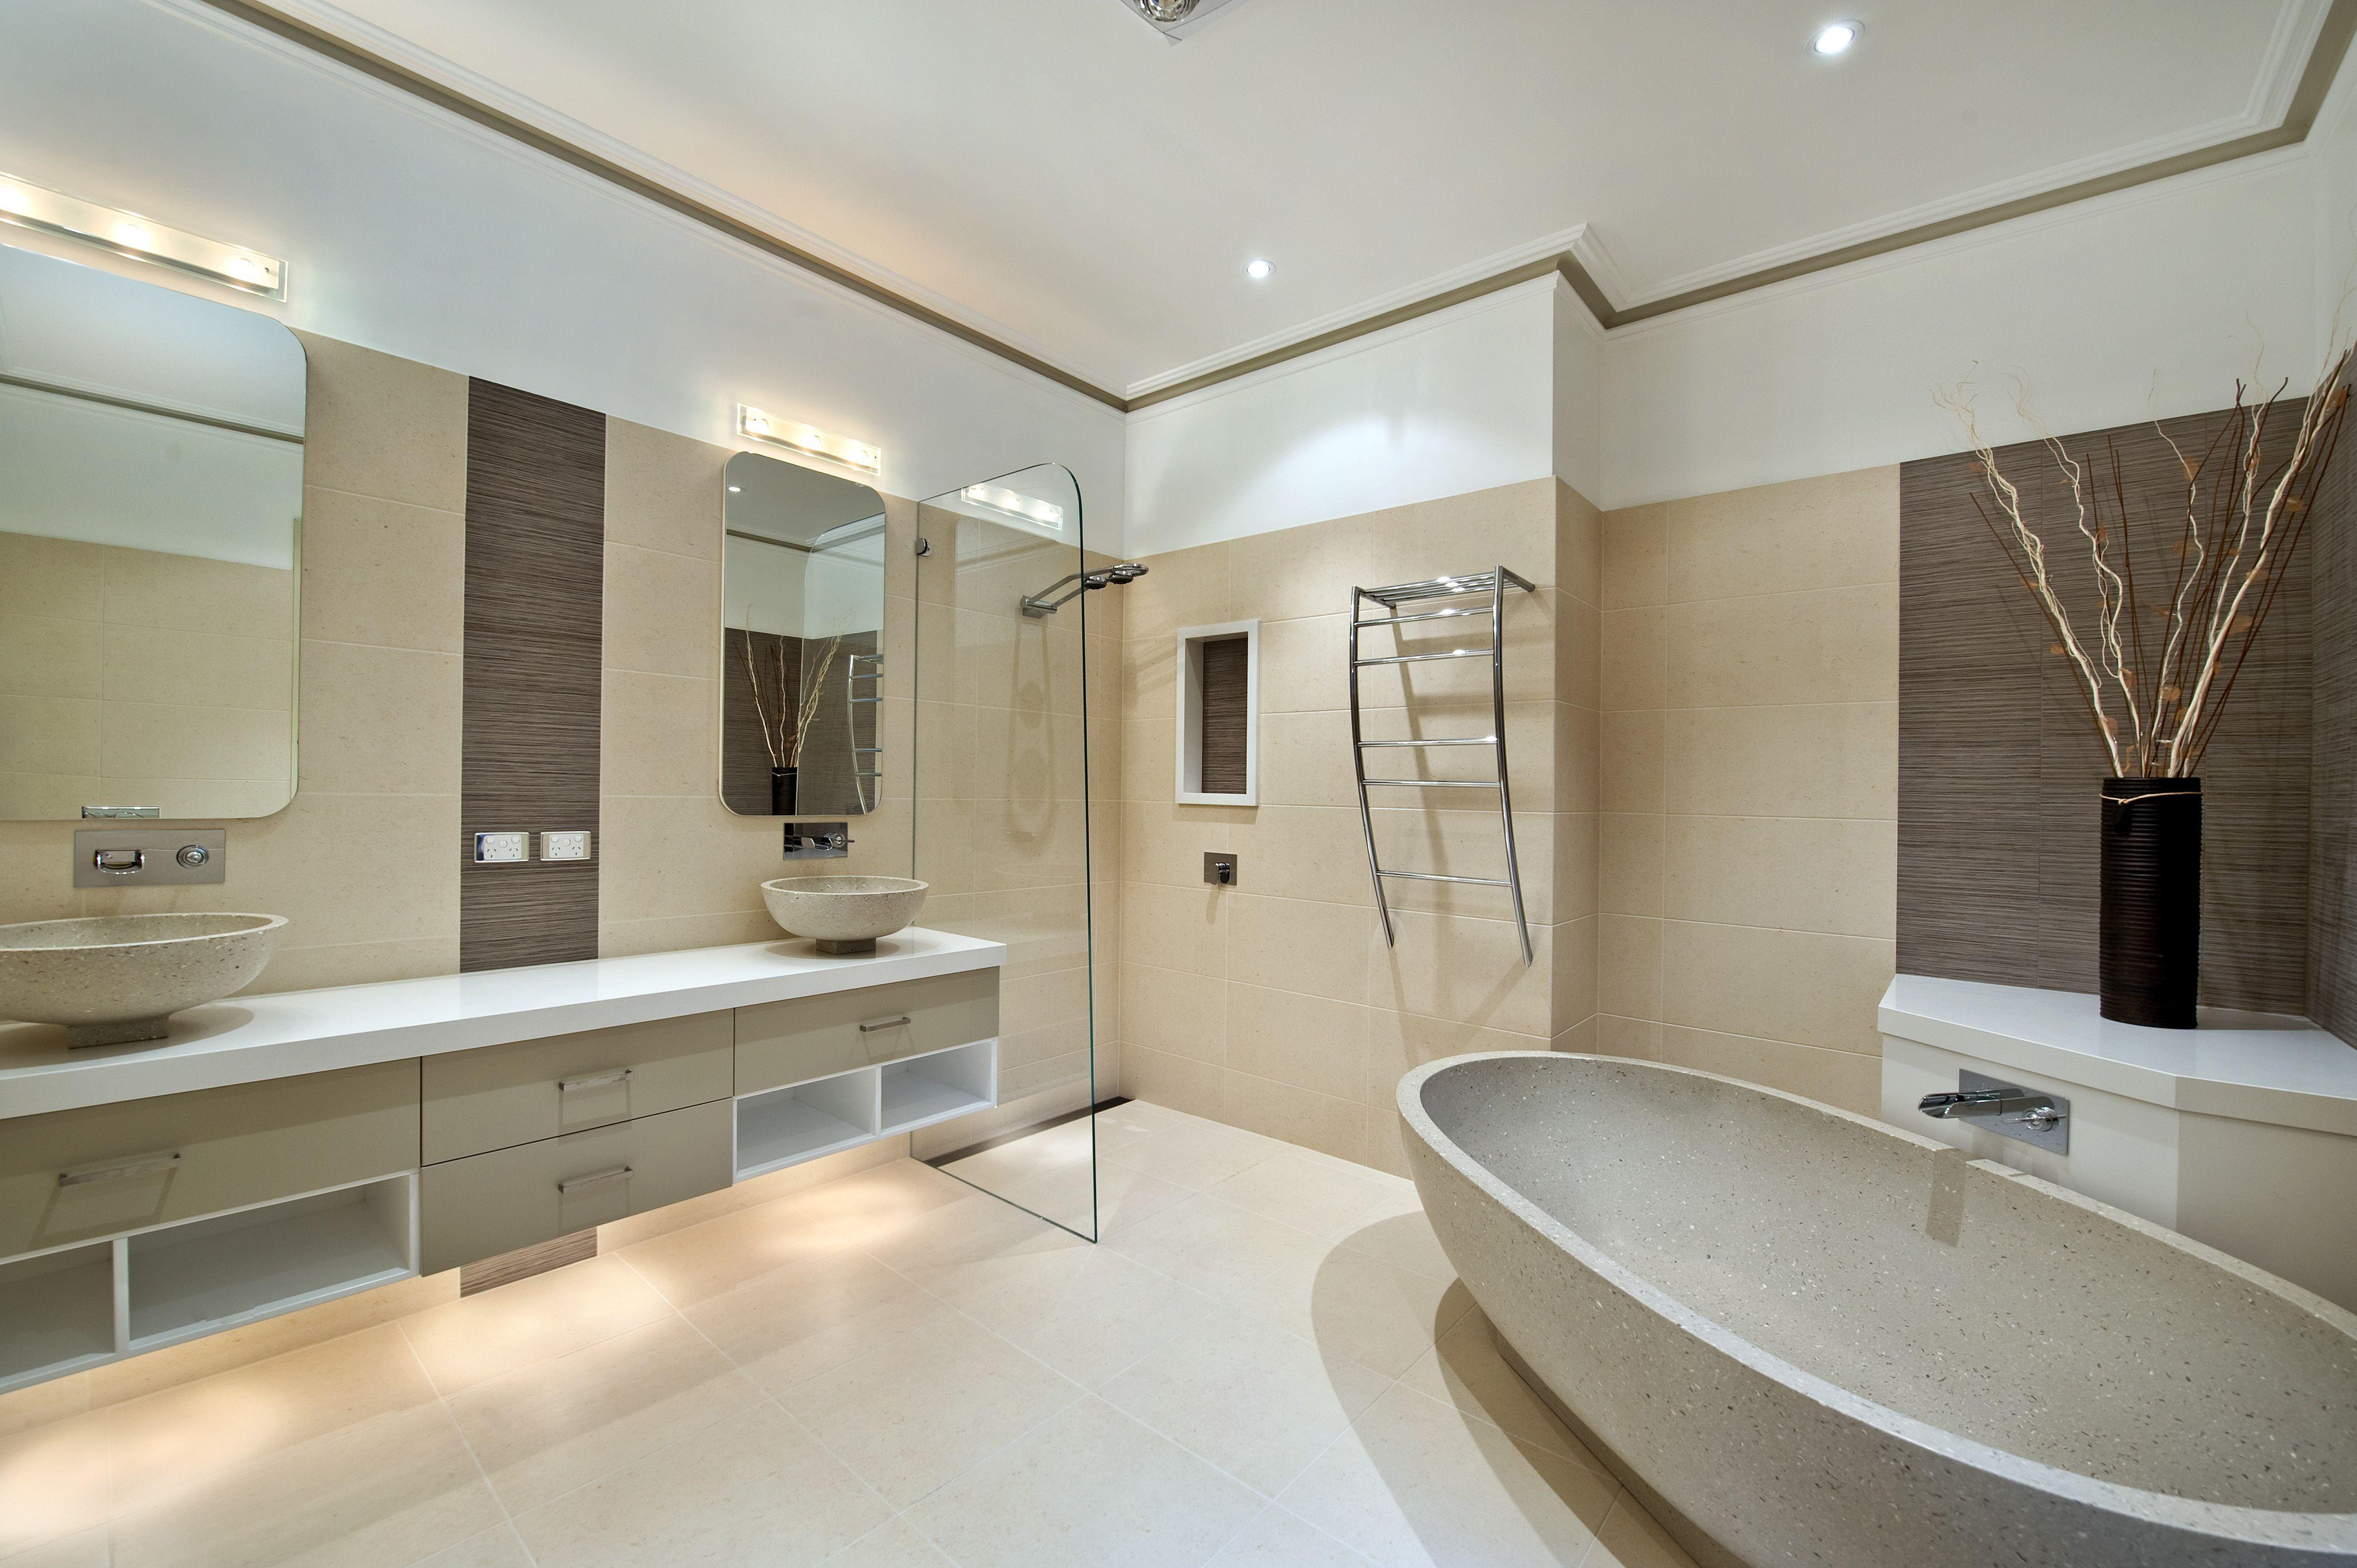 Award Winning Bathroom By Paul Hutchison Kitchen Bathroom Design Studios Main Bathroom Designs Bathroom Renovation Designs Contemporary Bathroom Vanity